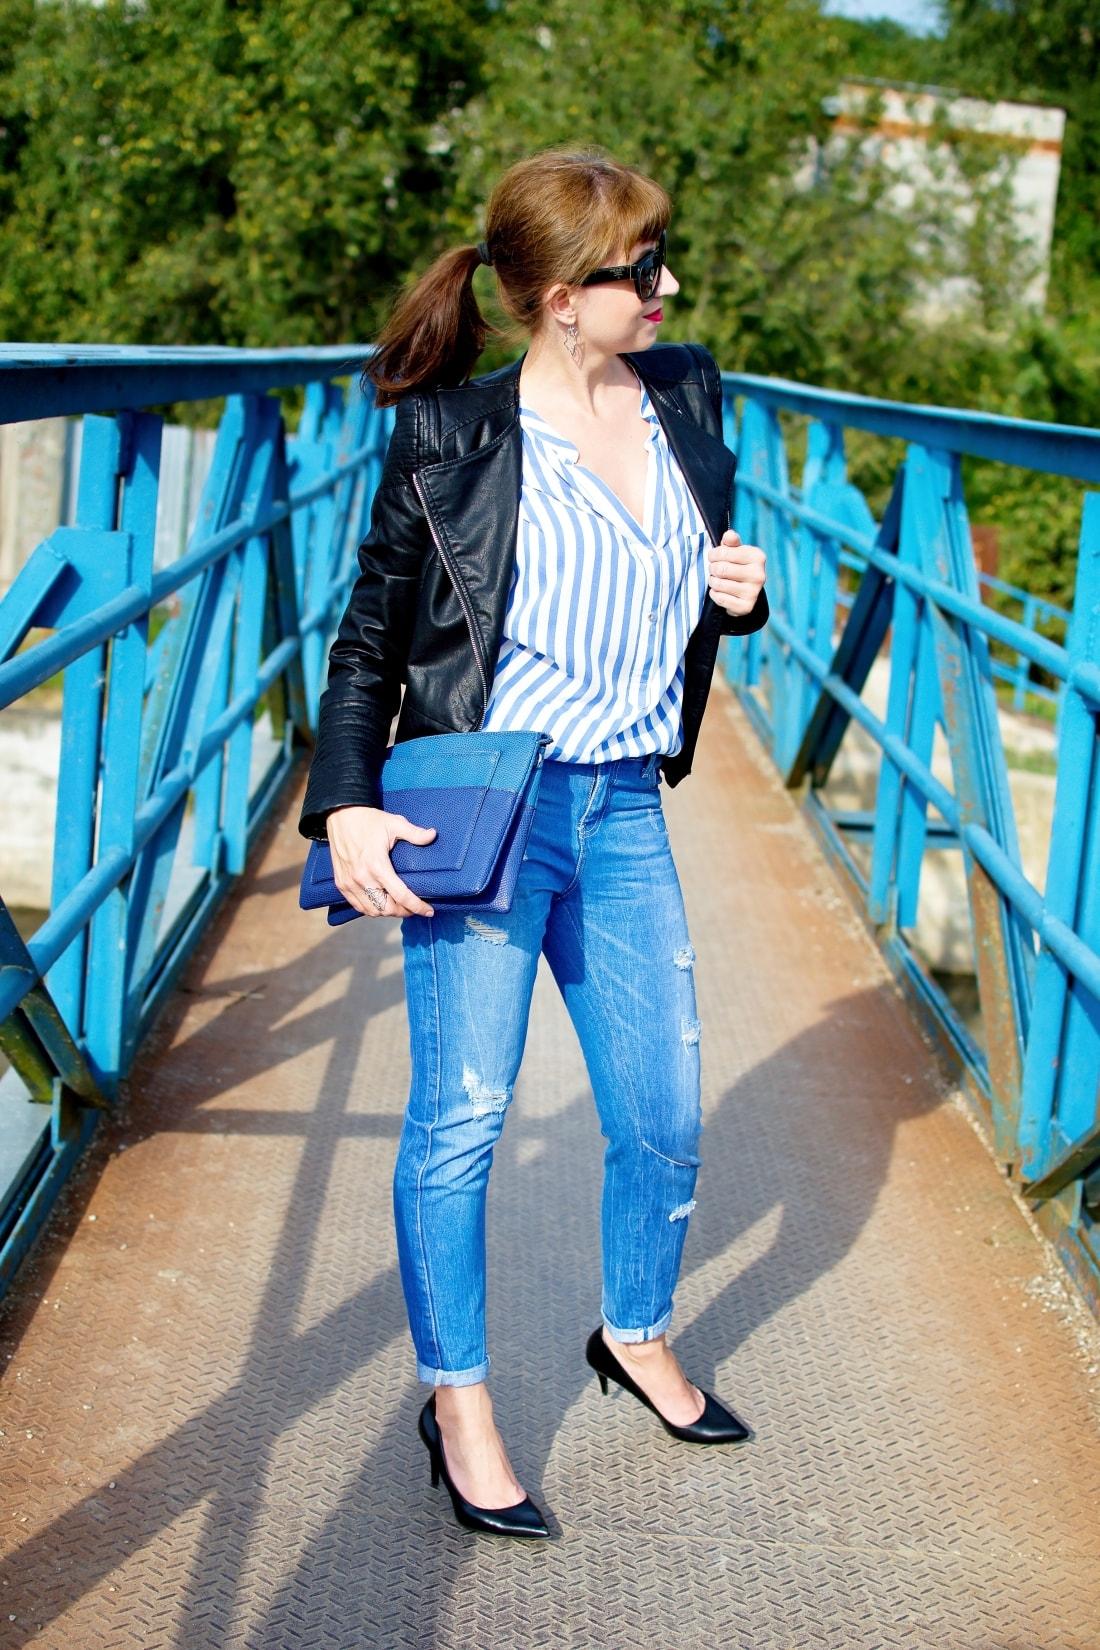 Move, move, move_Katharine-fashion is beautiful_7_Blog_Kožená bunda_Roztrhané džínsy_Prúžkovaná blúzka_Kabelka Parfois_Katarína Jakubčová_Fashion blogger